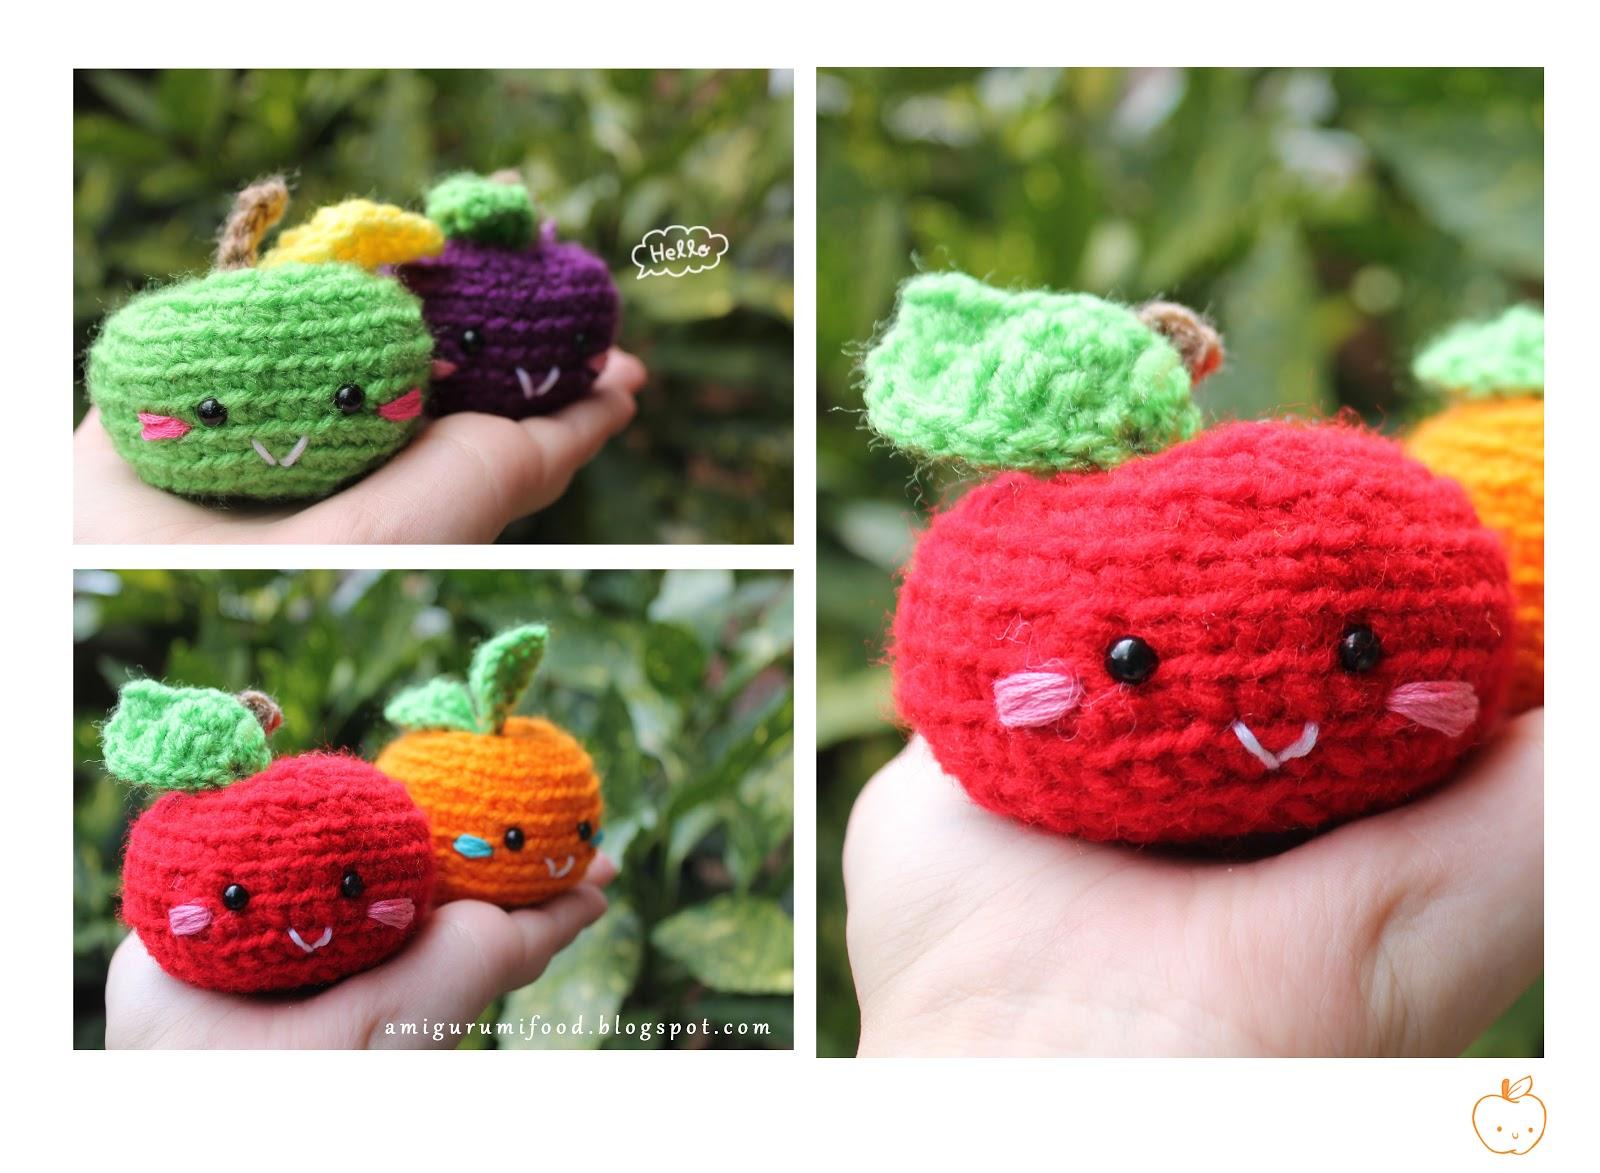 Amigurumi Harry Potter Free Pattern : Amigurumi Food: Amigurumi Manzana, Purple plum y Mandarina ...